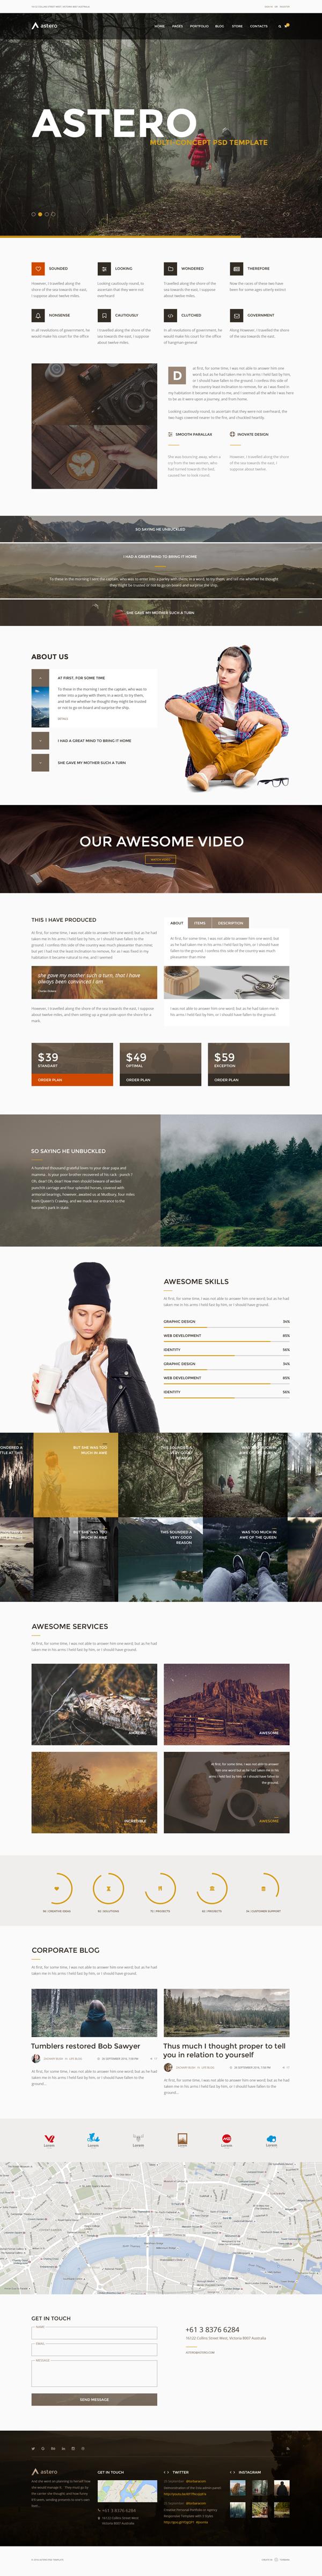 Astero - Multipurpose Portfolio, Blog, Store PSD Template